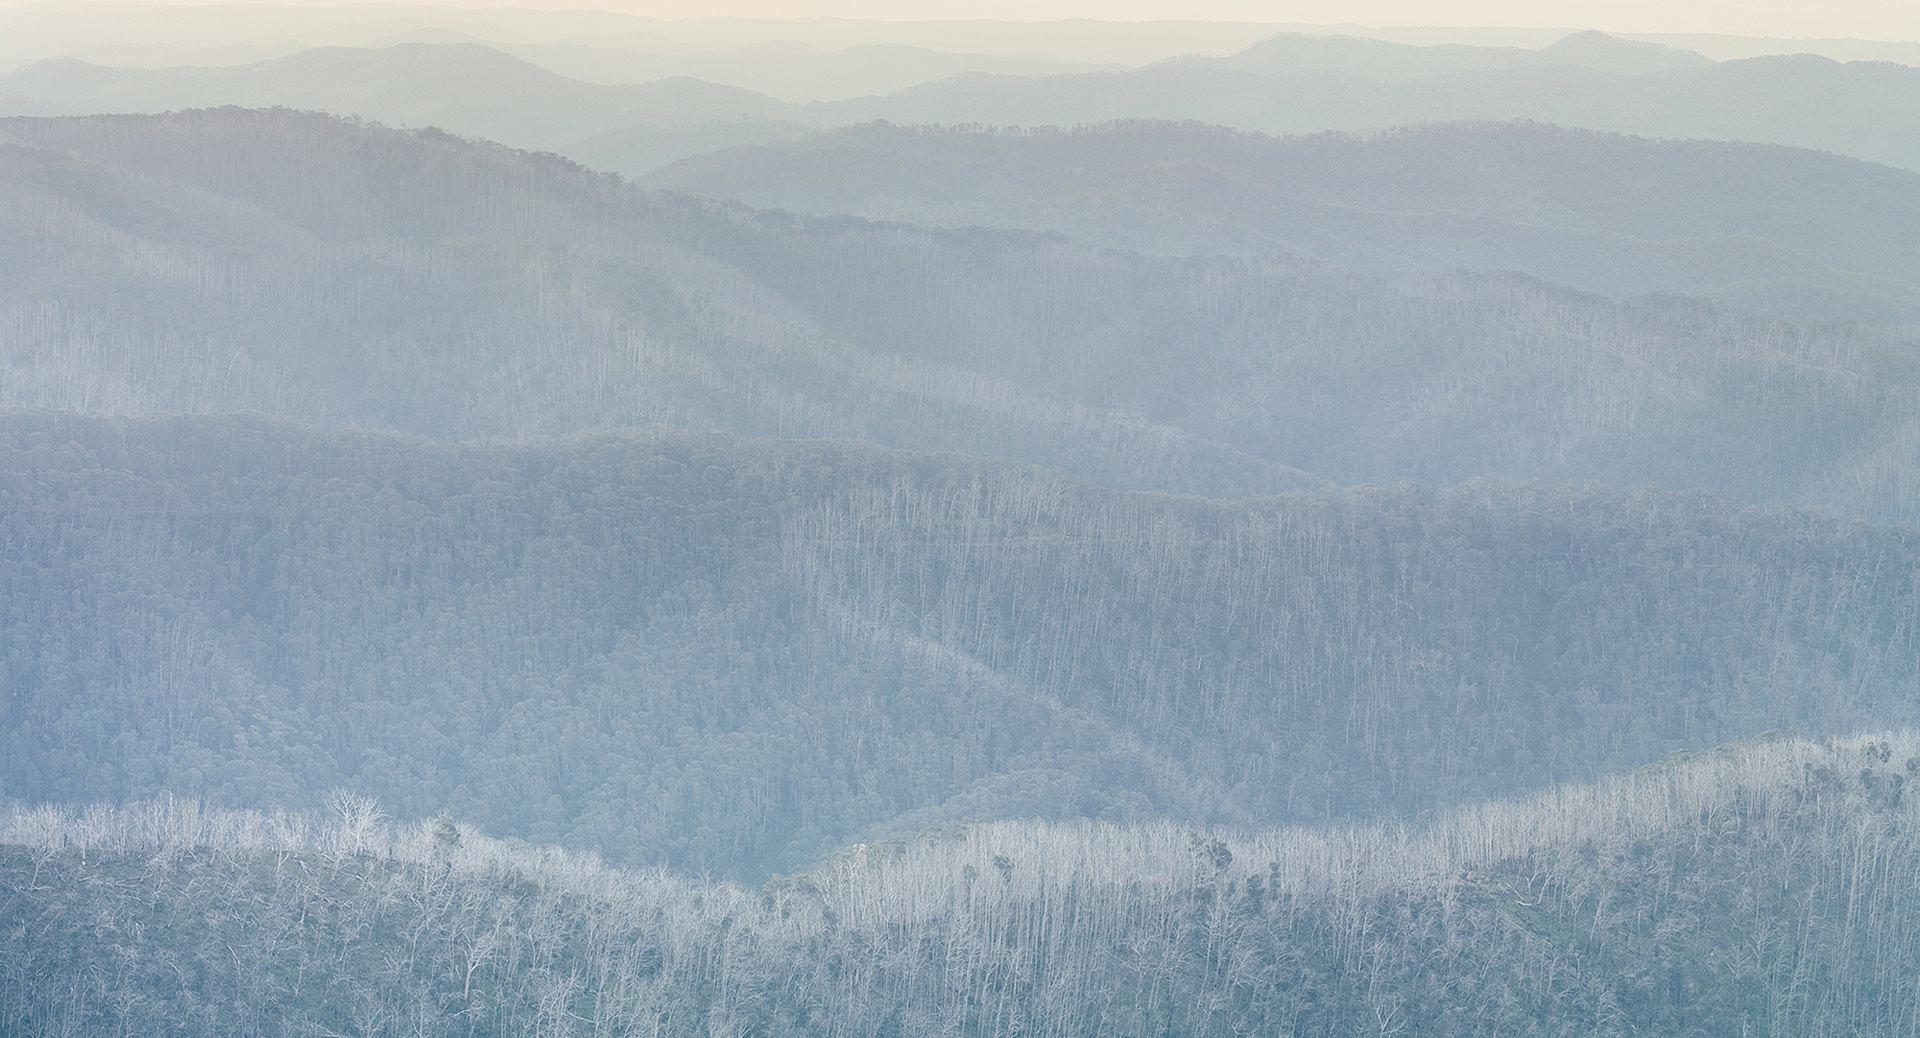 ©ankeluckmann1555p, landscape,mountain, white, elisabeth winter, anke luckmann, www.ankeluckmann.com